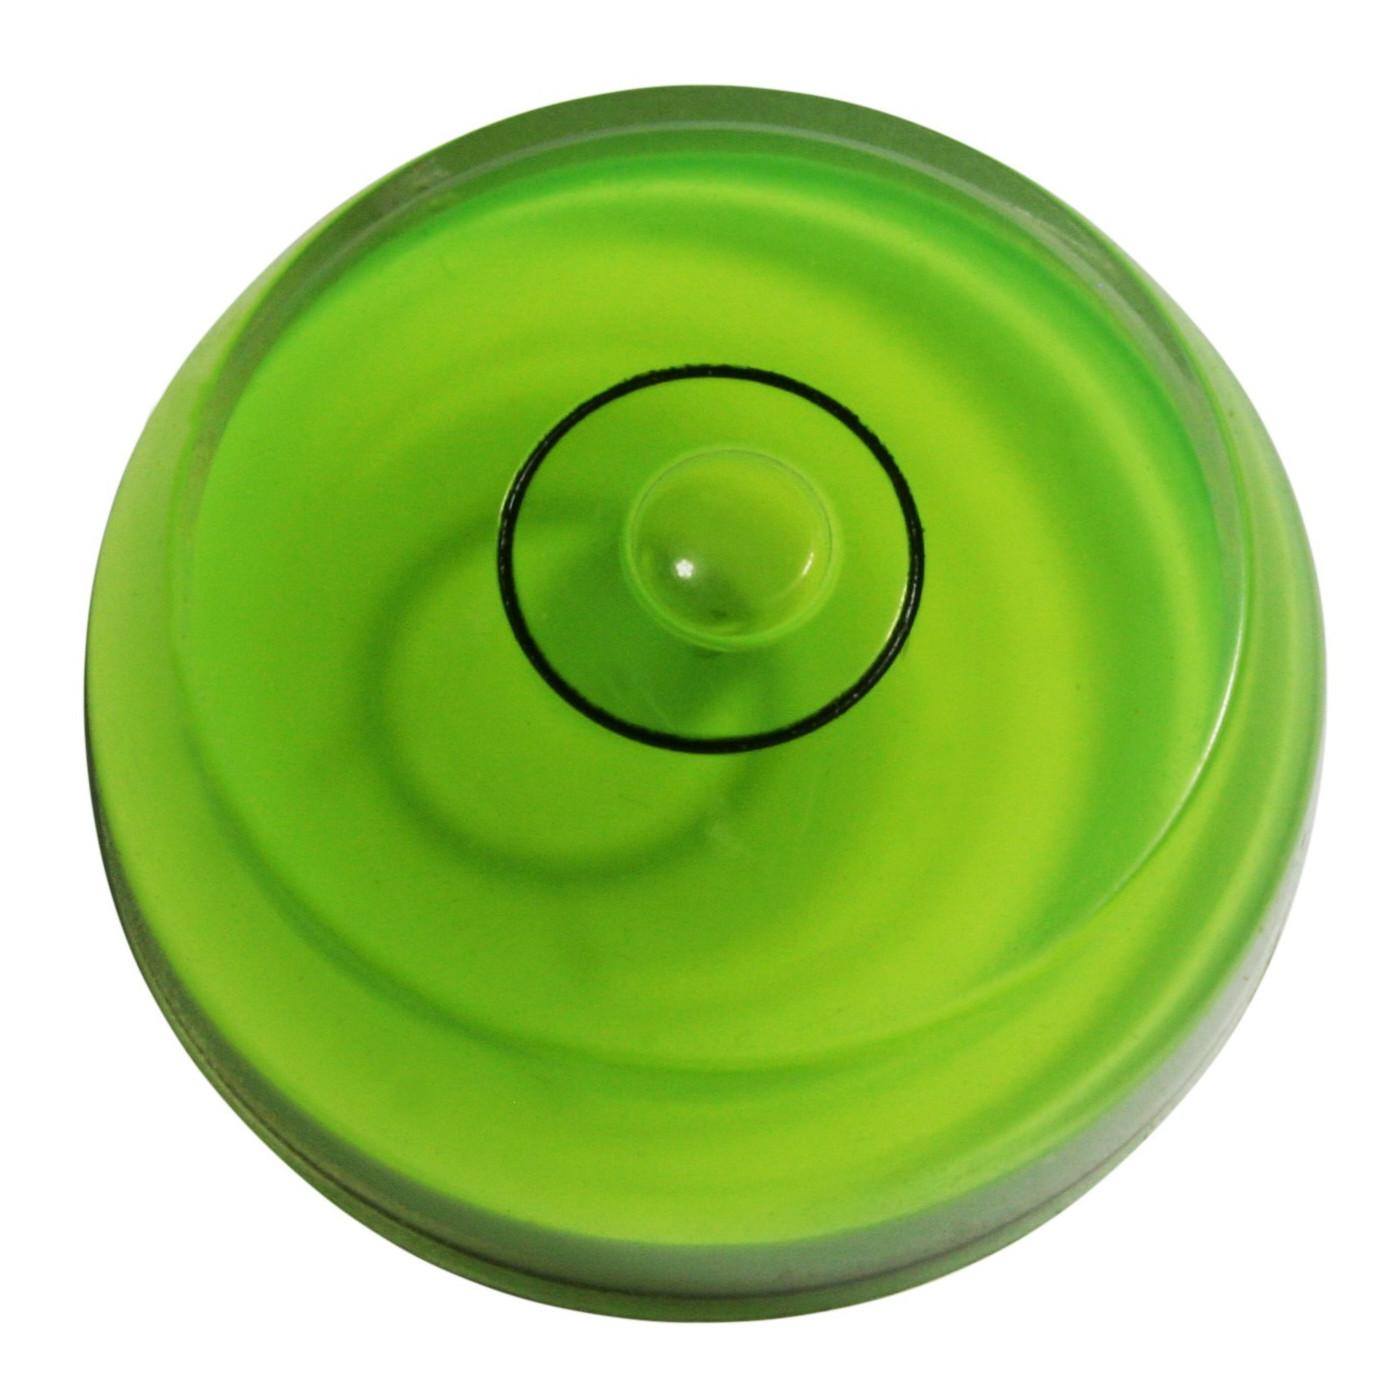 Set van 10 ronde waterpassen (groen, afgerond)  - 1